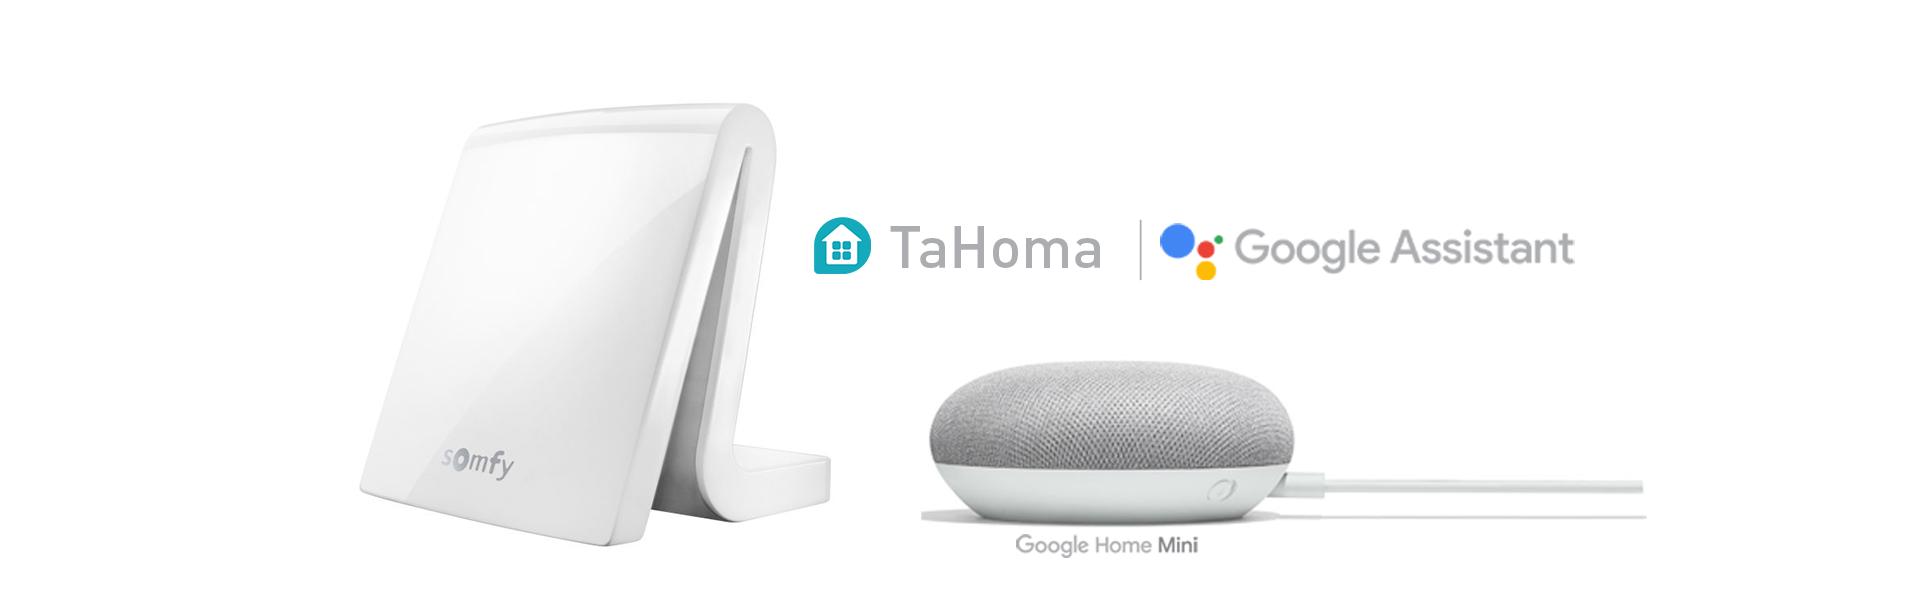 Somfy TaHoma inkl. Google Home Mini